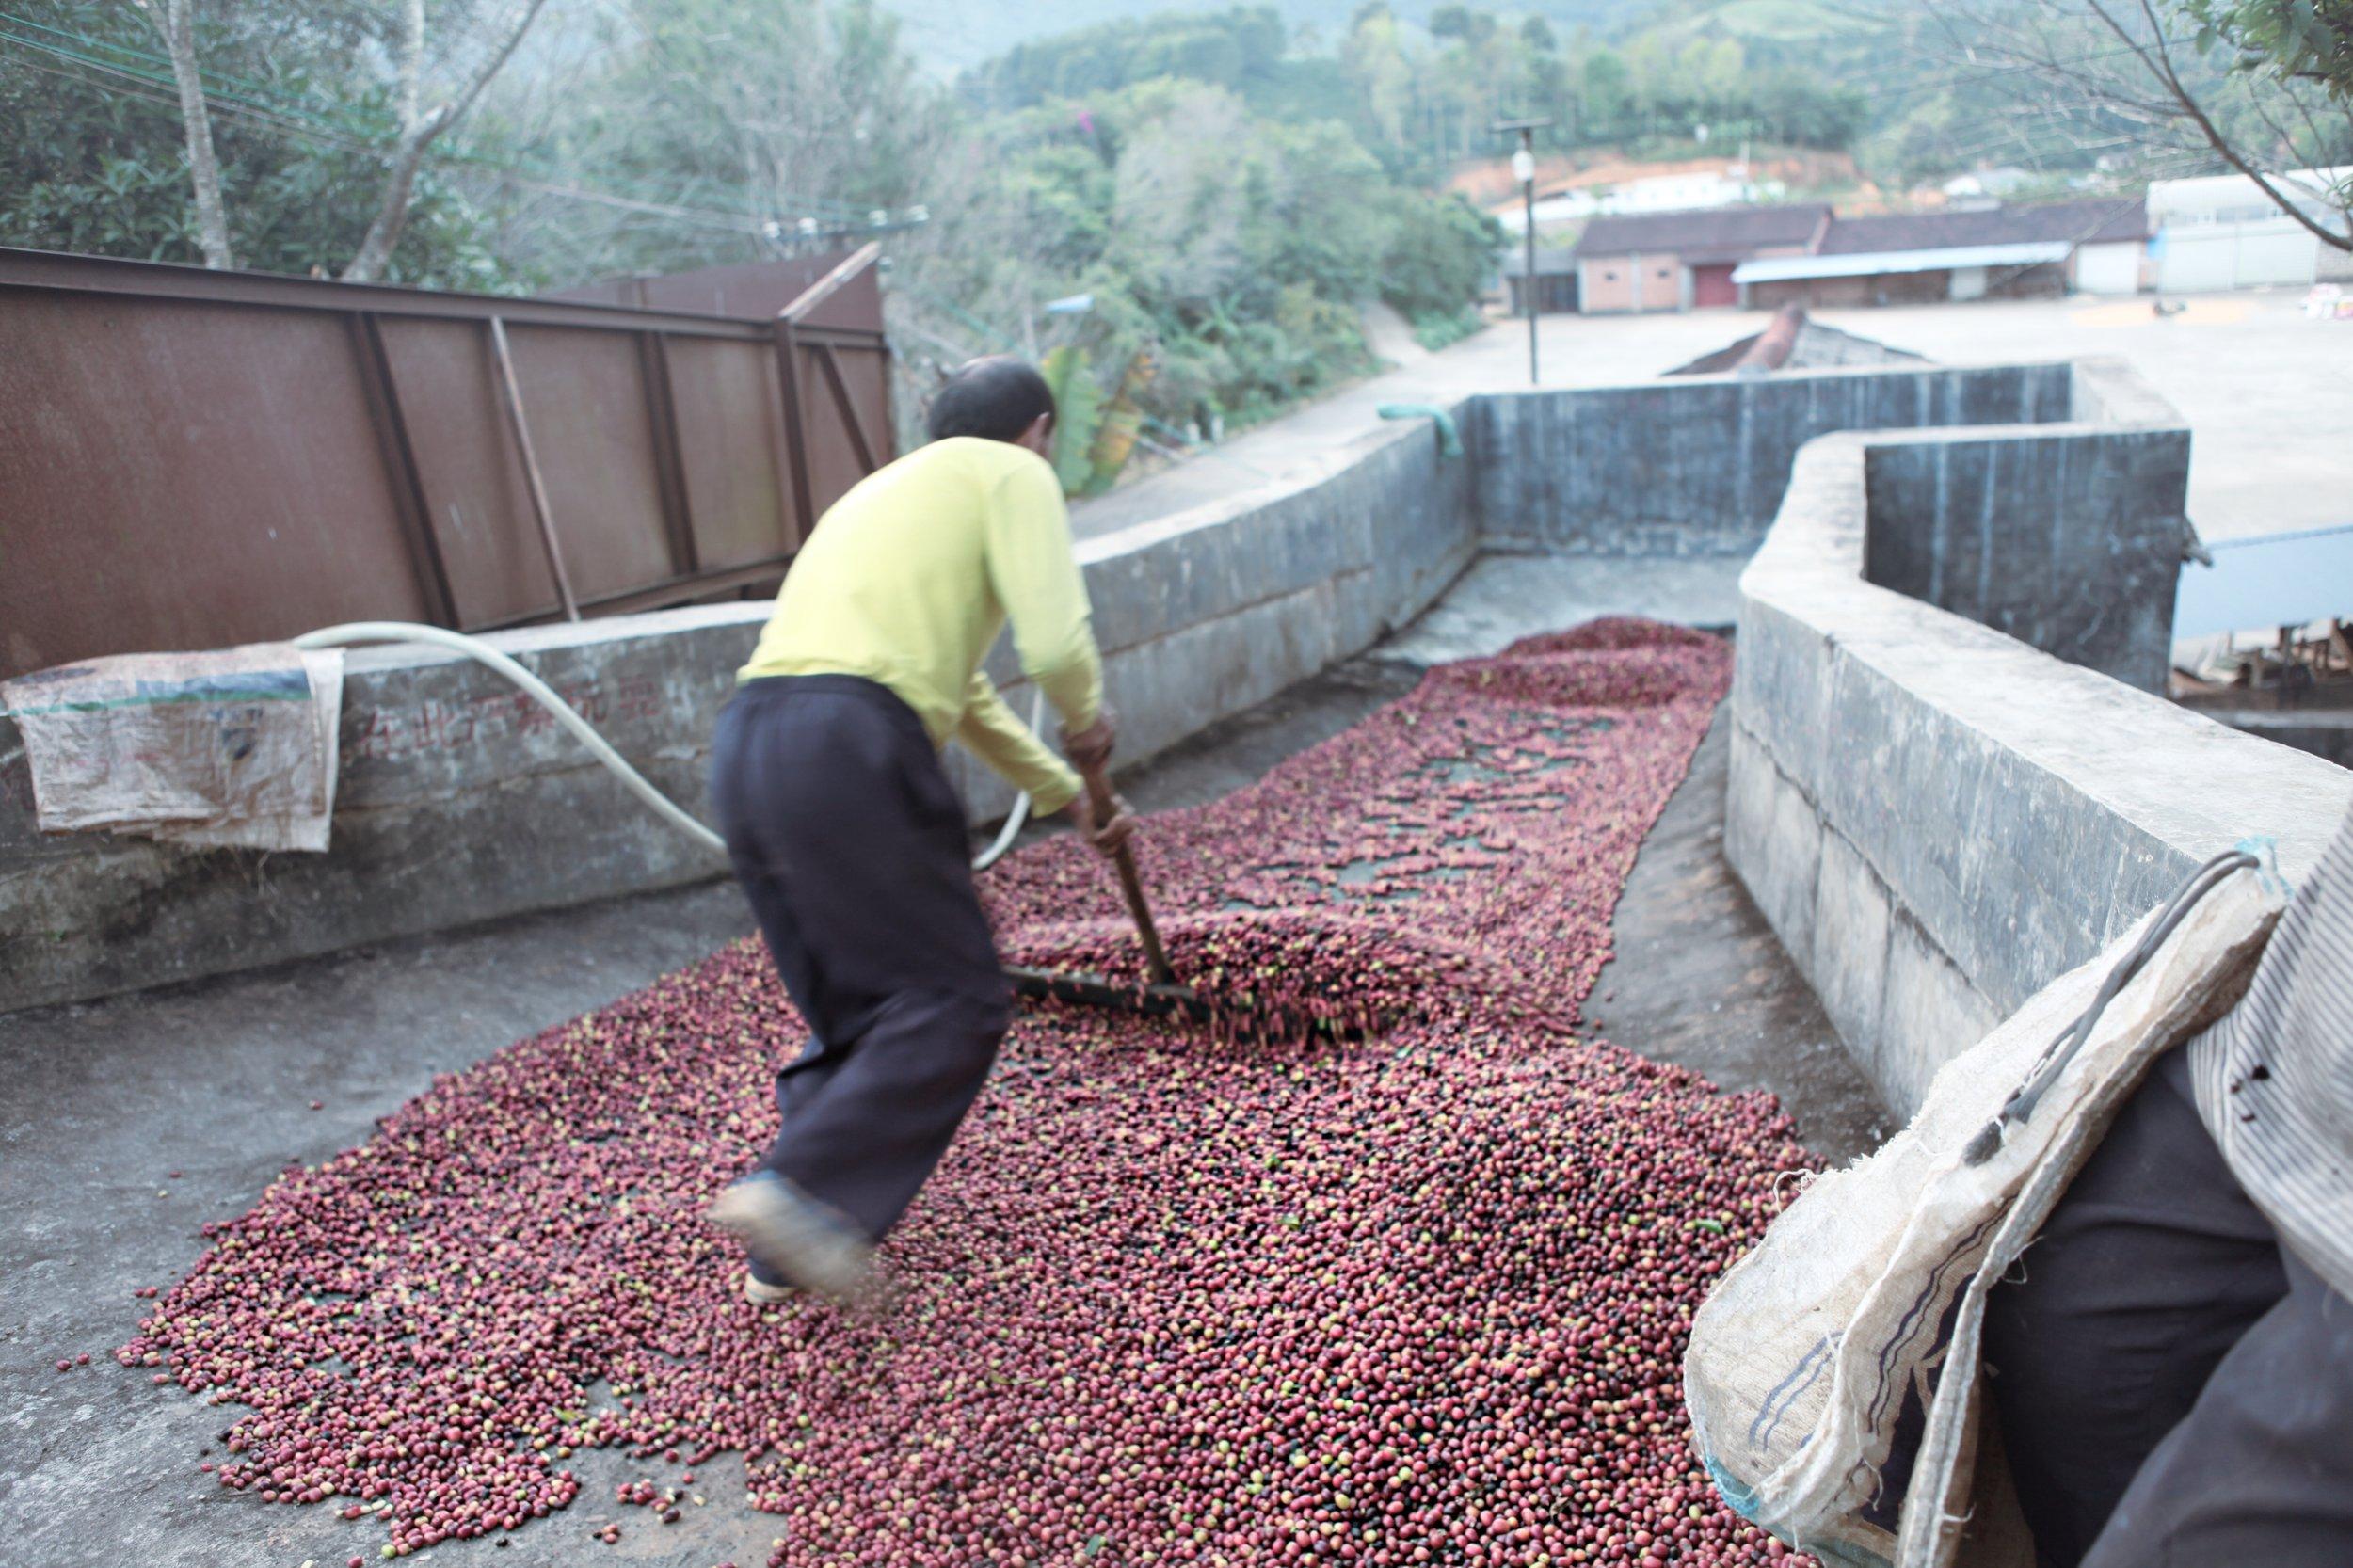 unload the coffee cherries